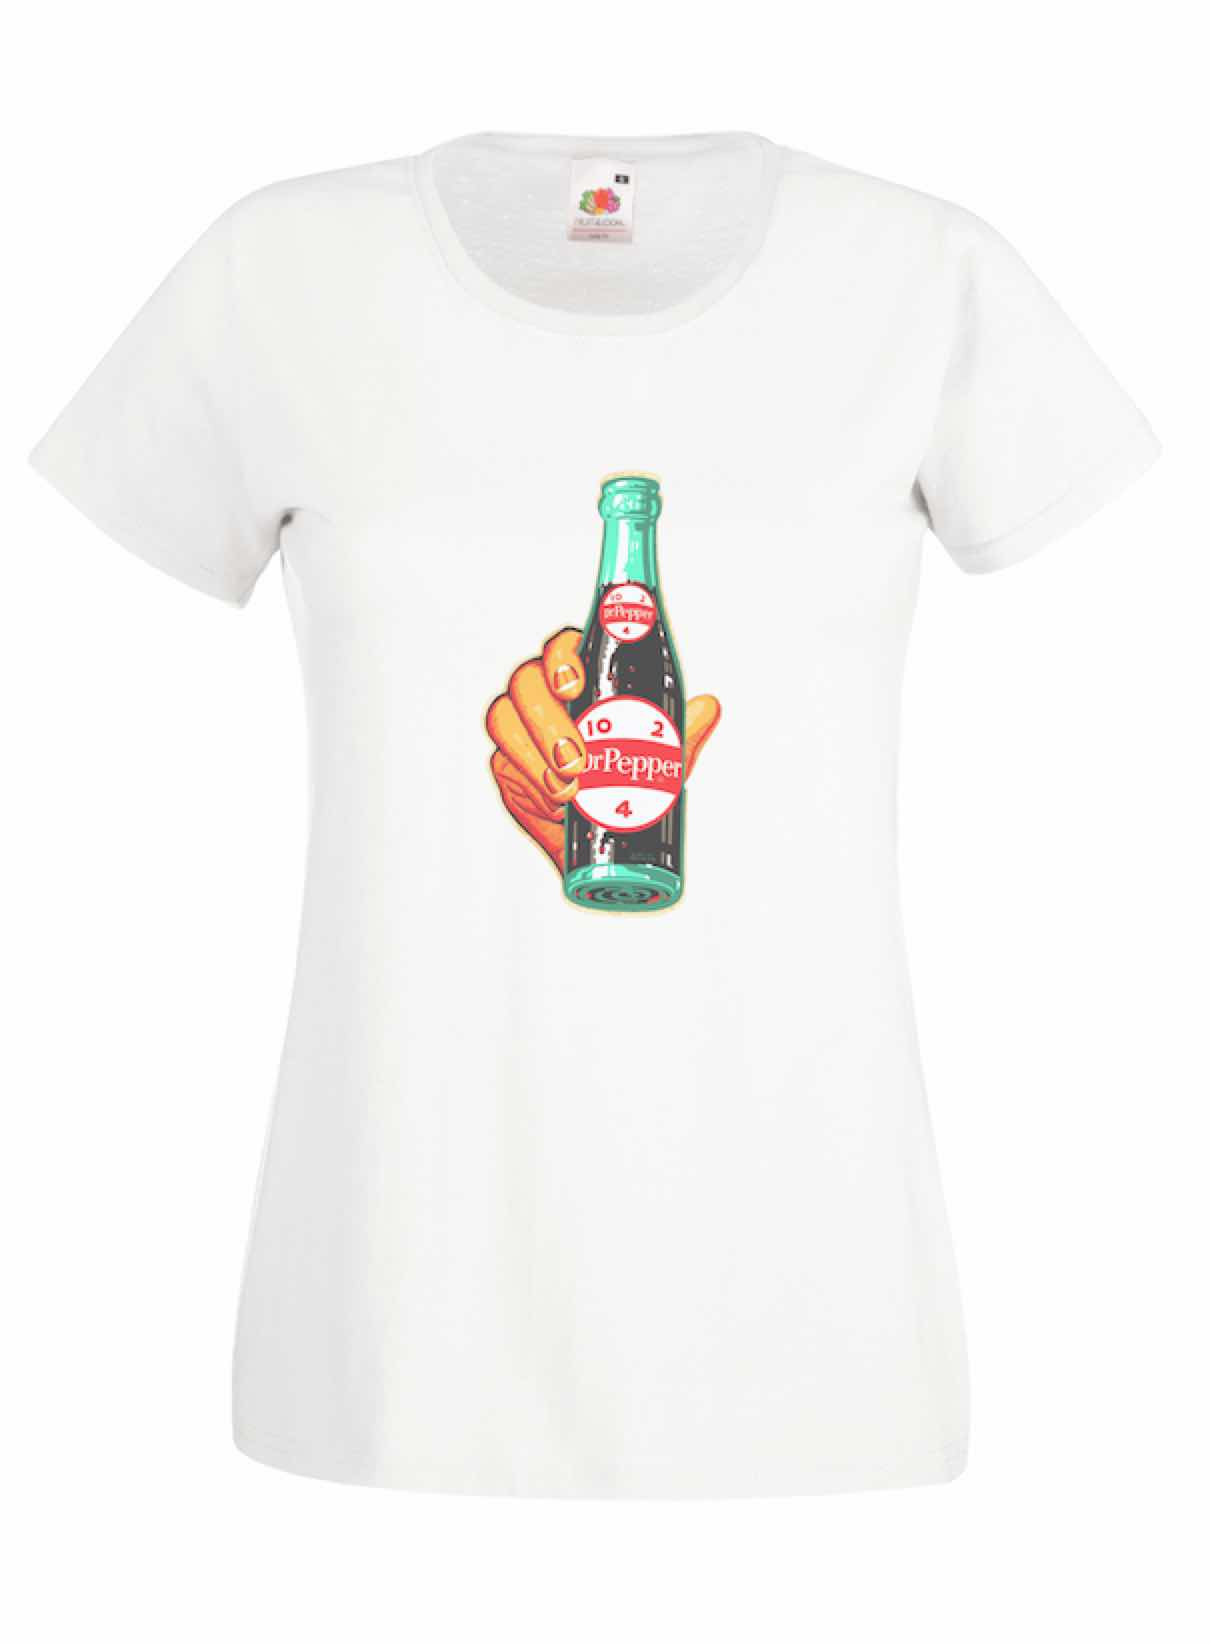 Dr Pepper design for t-shirt, hoodie & sweatshirt